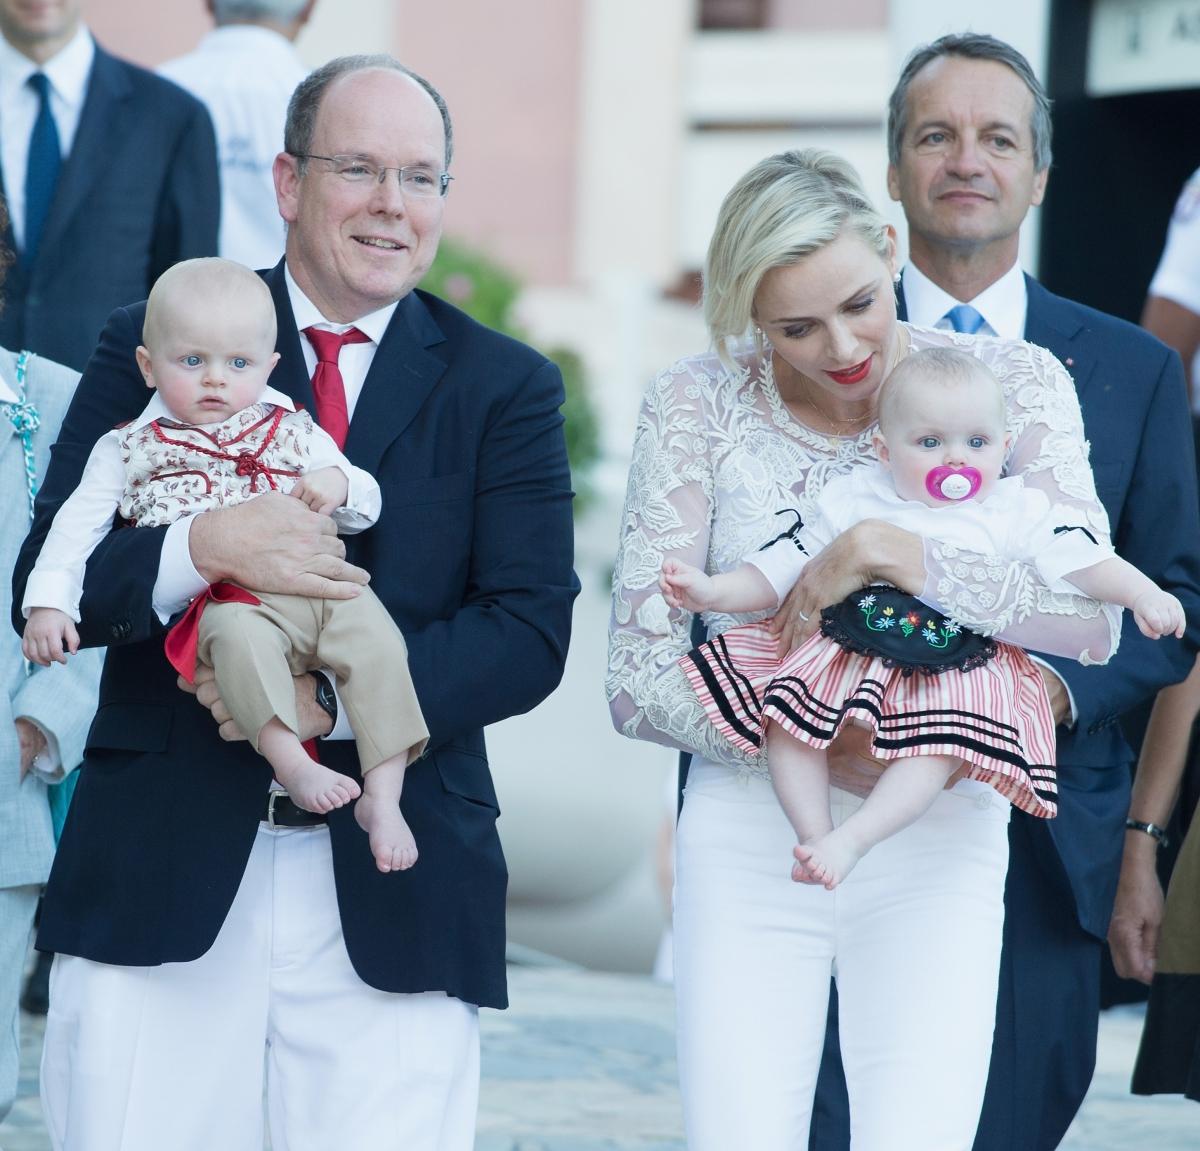 Princess Charlene with her twins